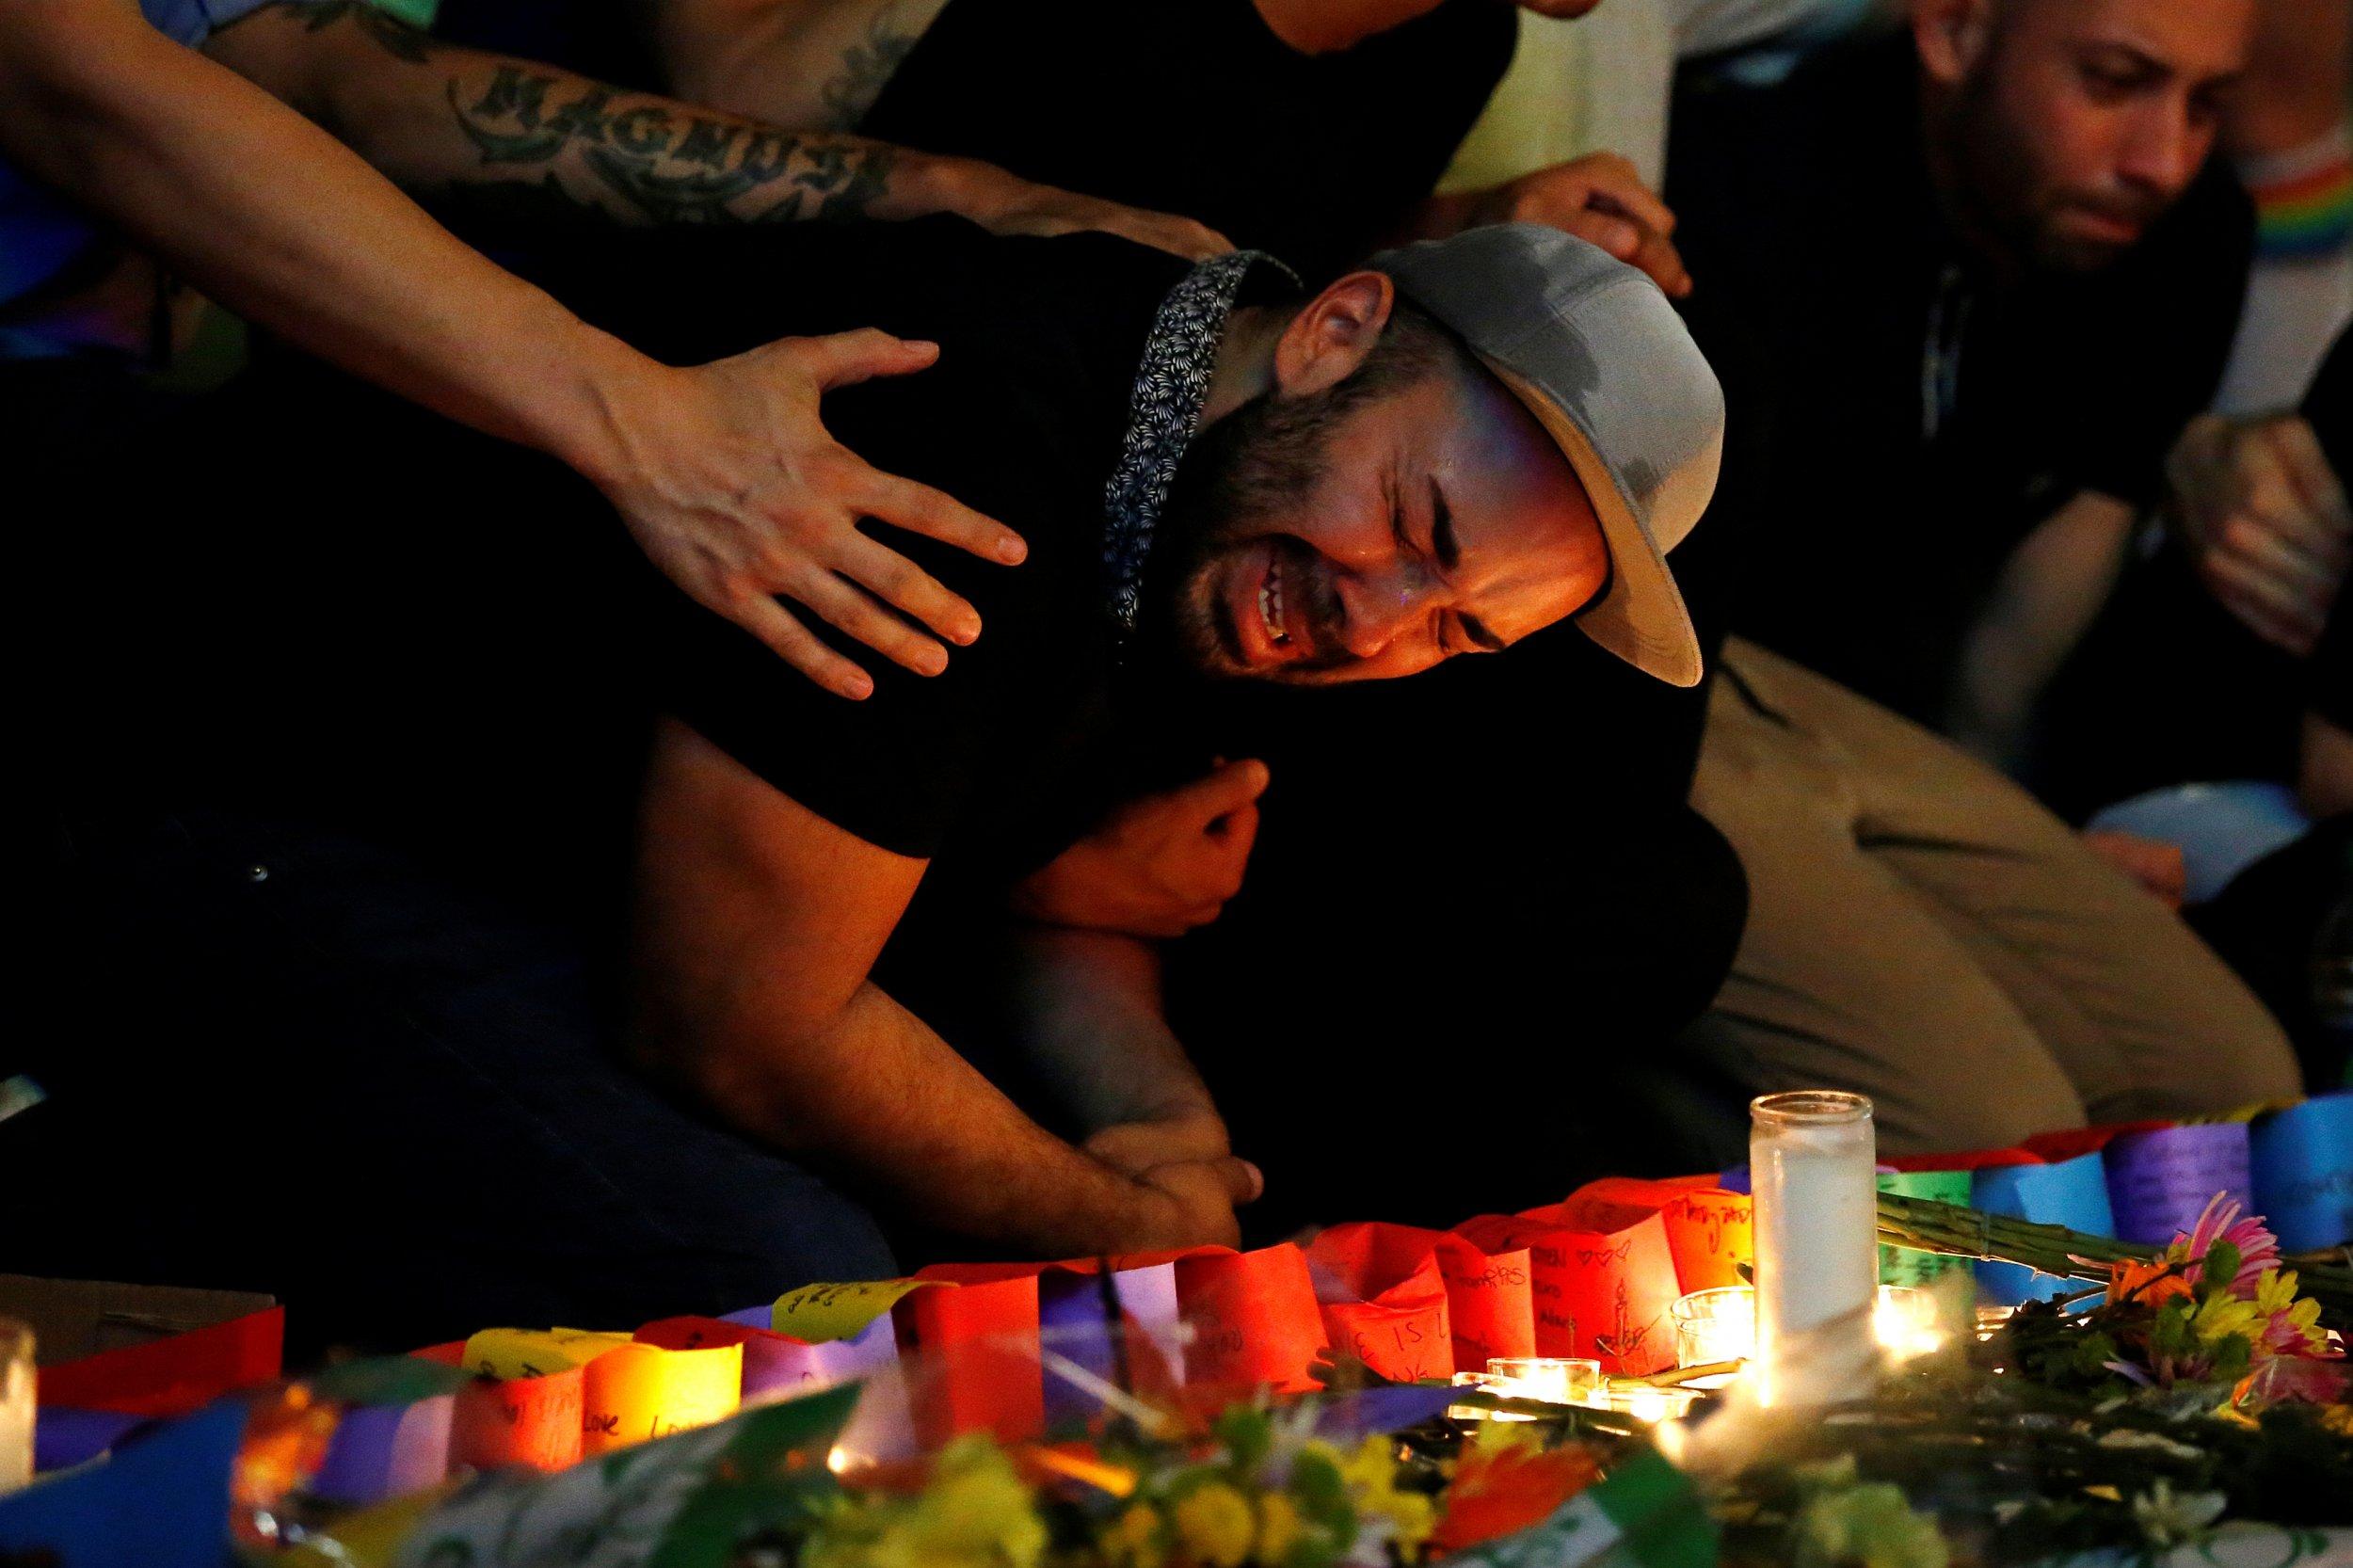 Lgbt Pride Parades Take Somber Tone After Orlando Shooting